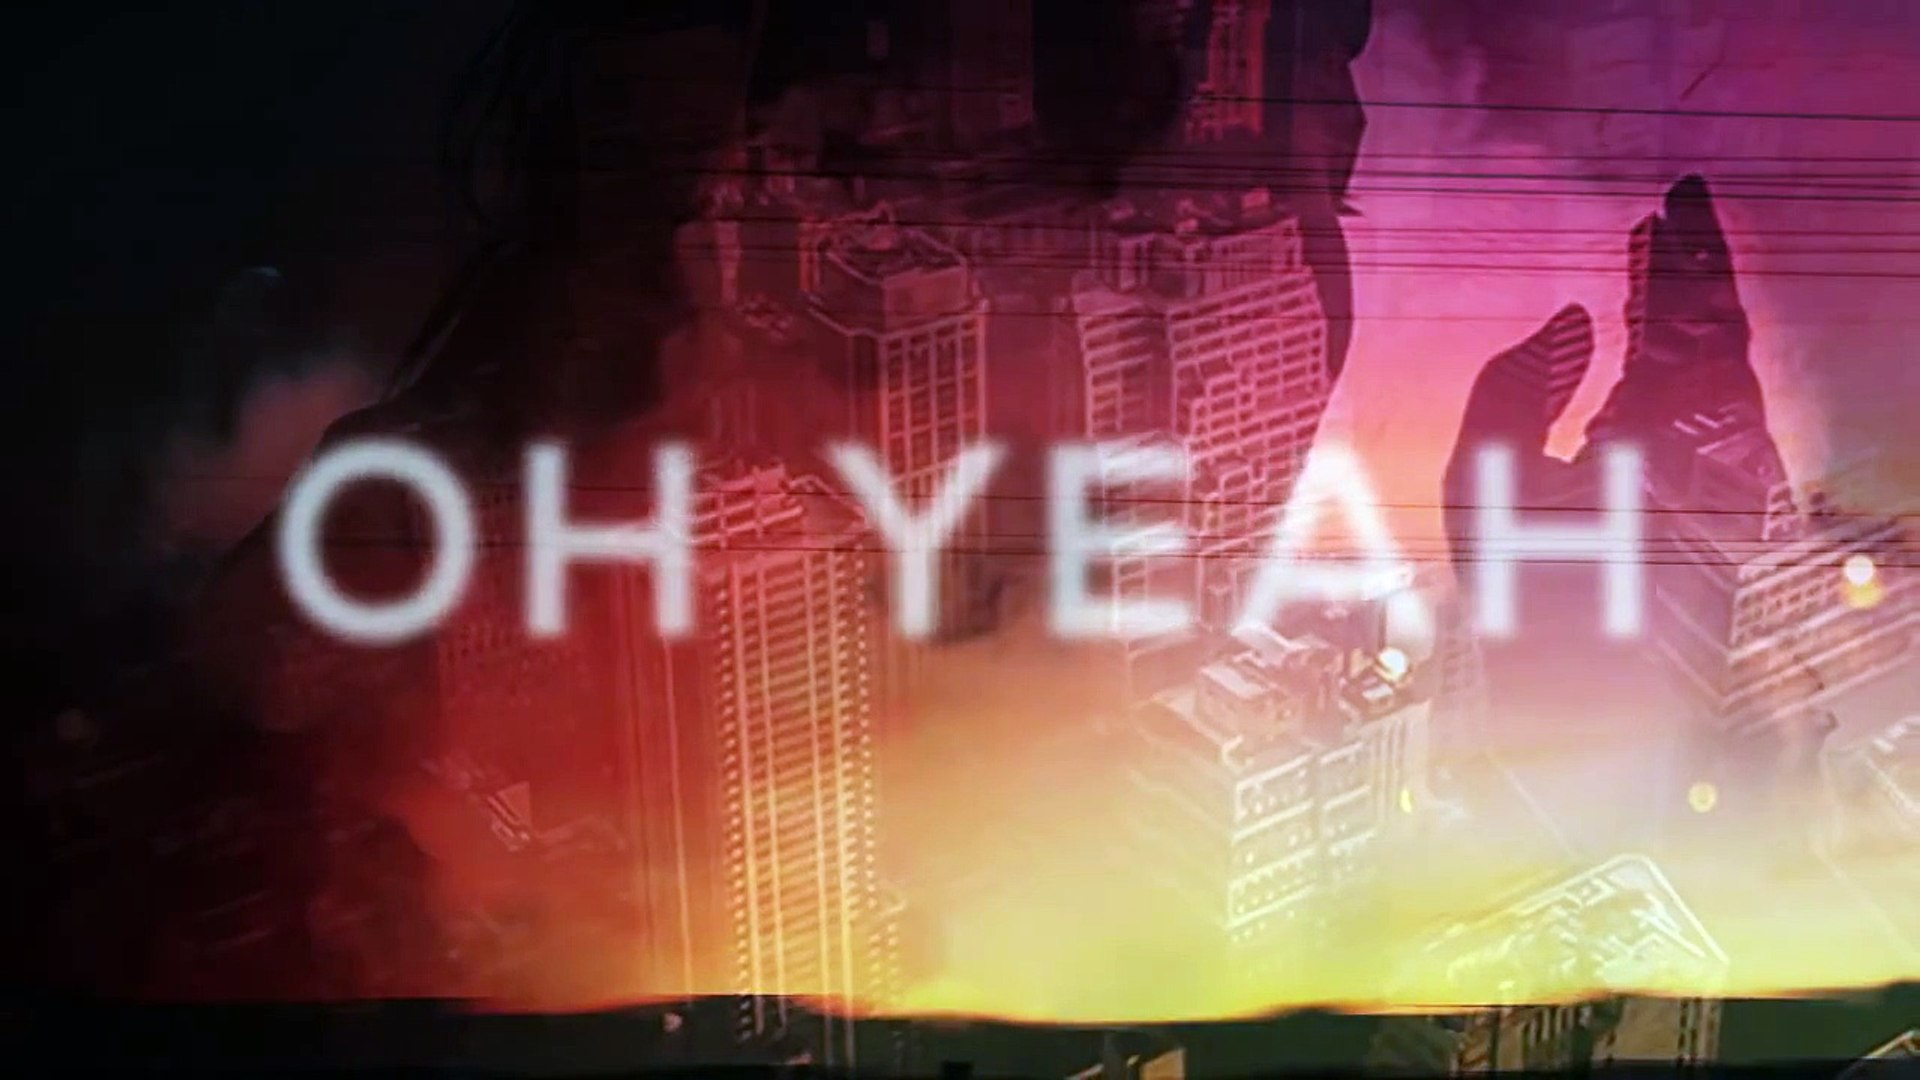 ODESZA - Say My Name (feat. Zyra) - Lyric Video